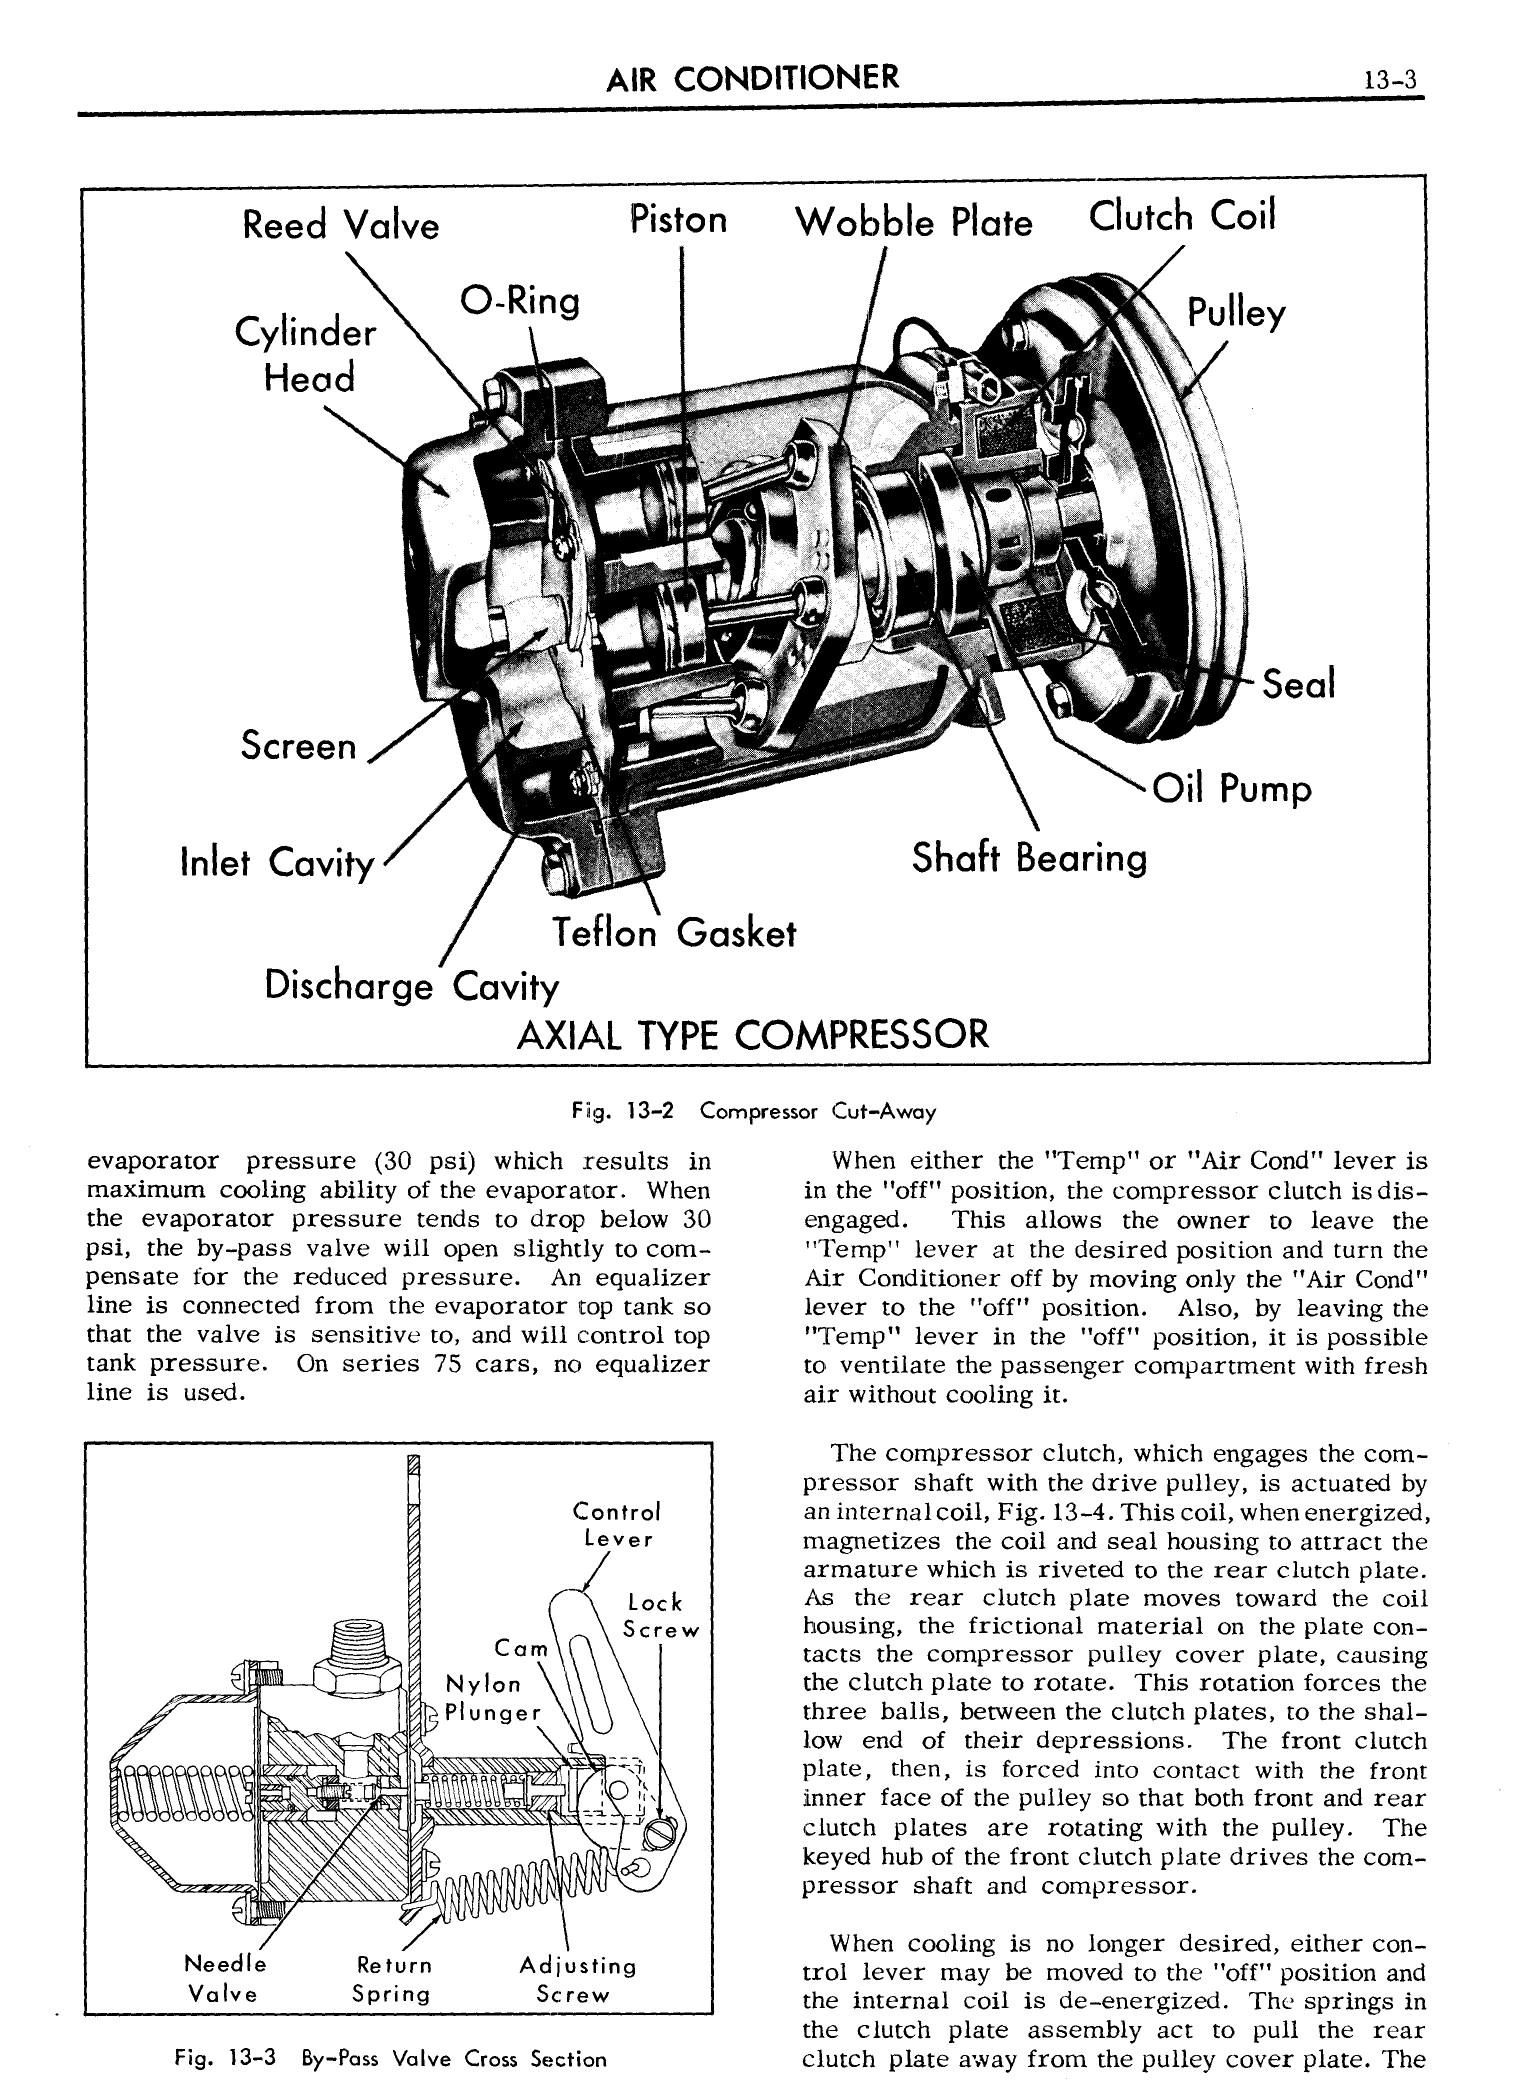 1957 Cadillac Shop Manual- Air Conditioner Page 3 of 22